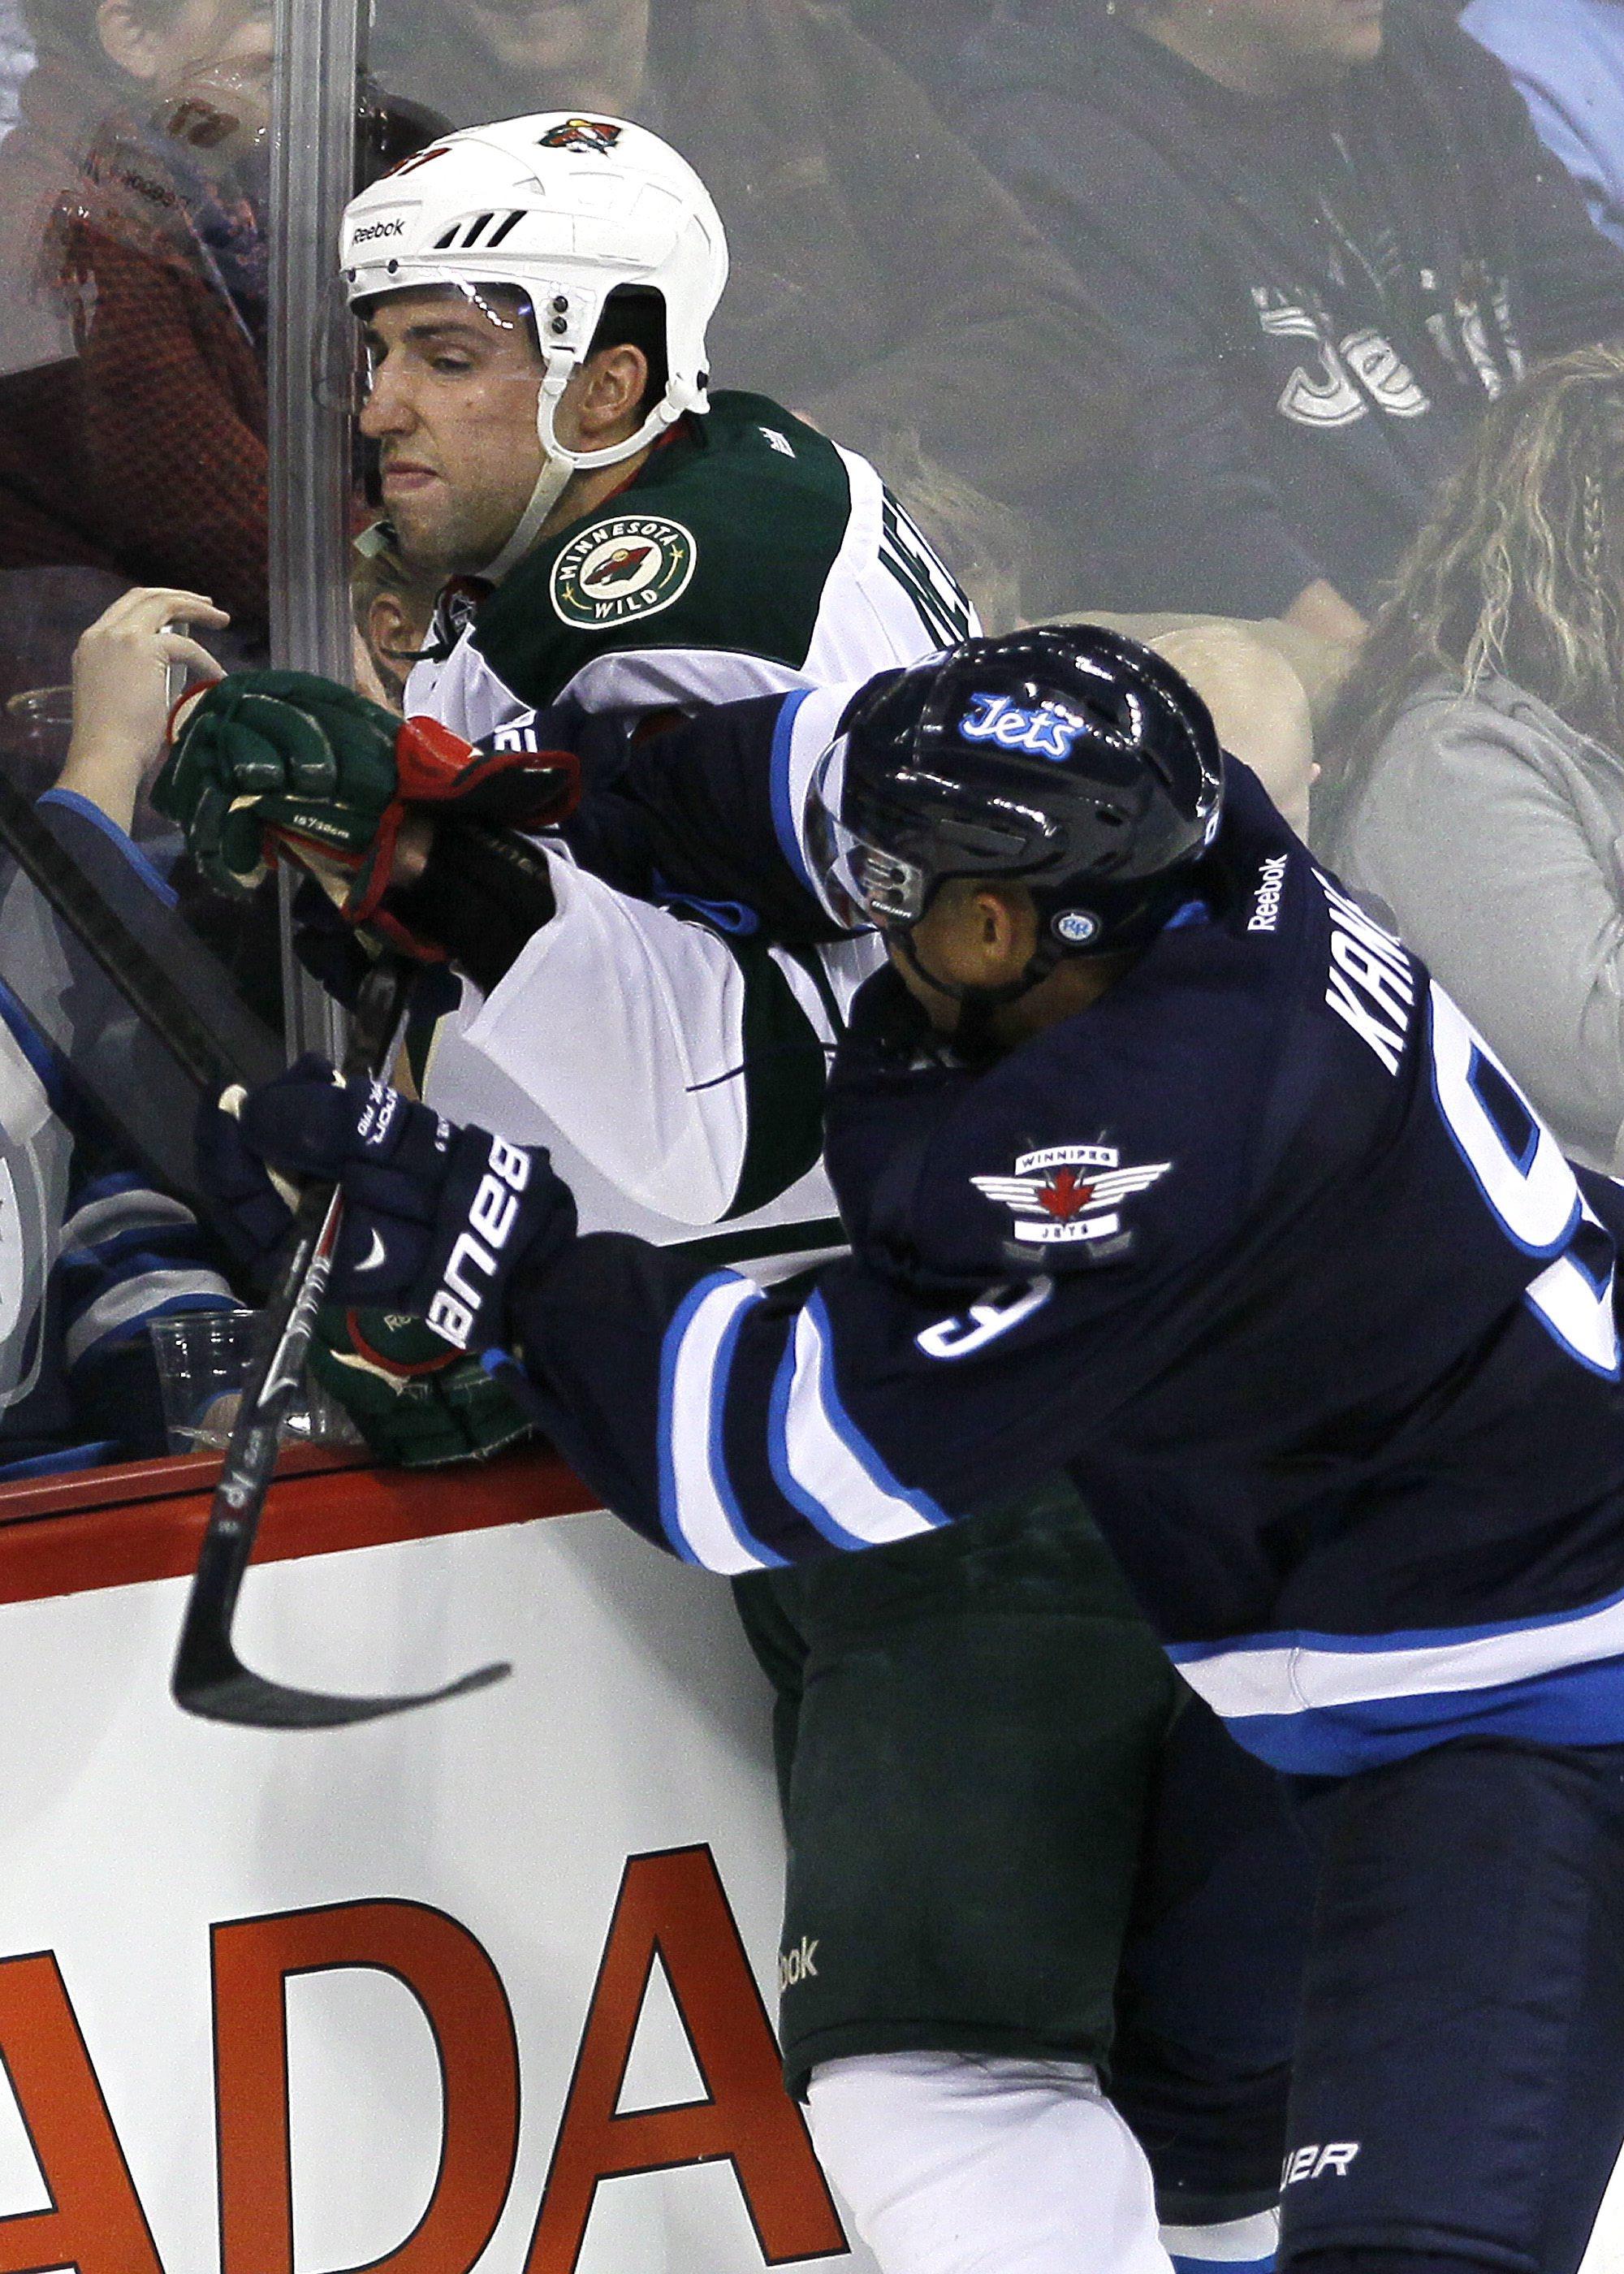 Winnipeg Jets' Evander Kane (9) takes out Minnesota Wild's Kyle Medvec (67) during third-period preseason NHL hockey game action in Winnipeg, Manitoba, Thursday, Sept. 19, 2013